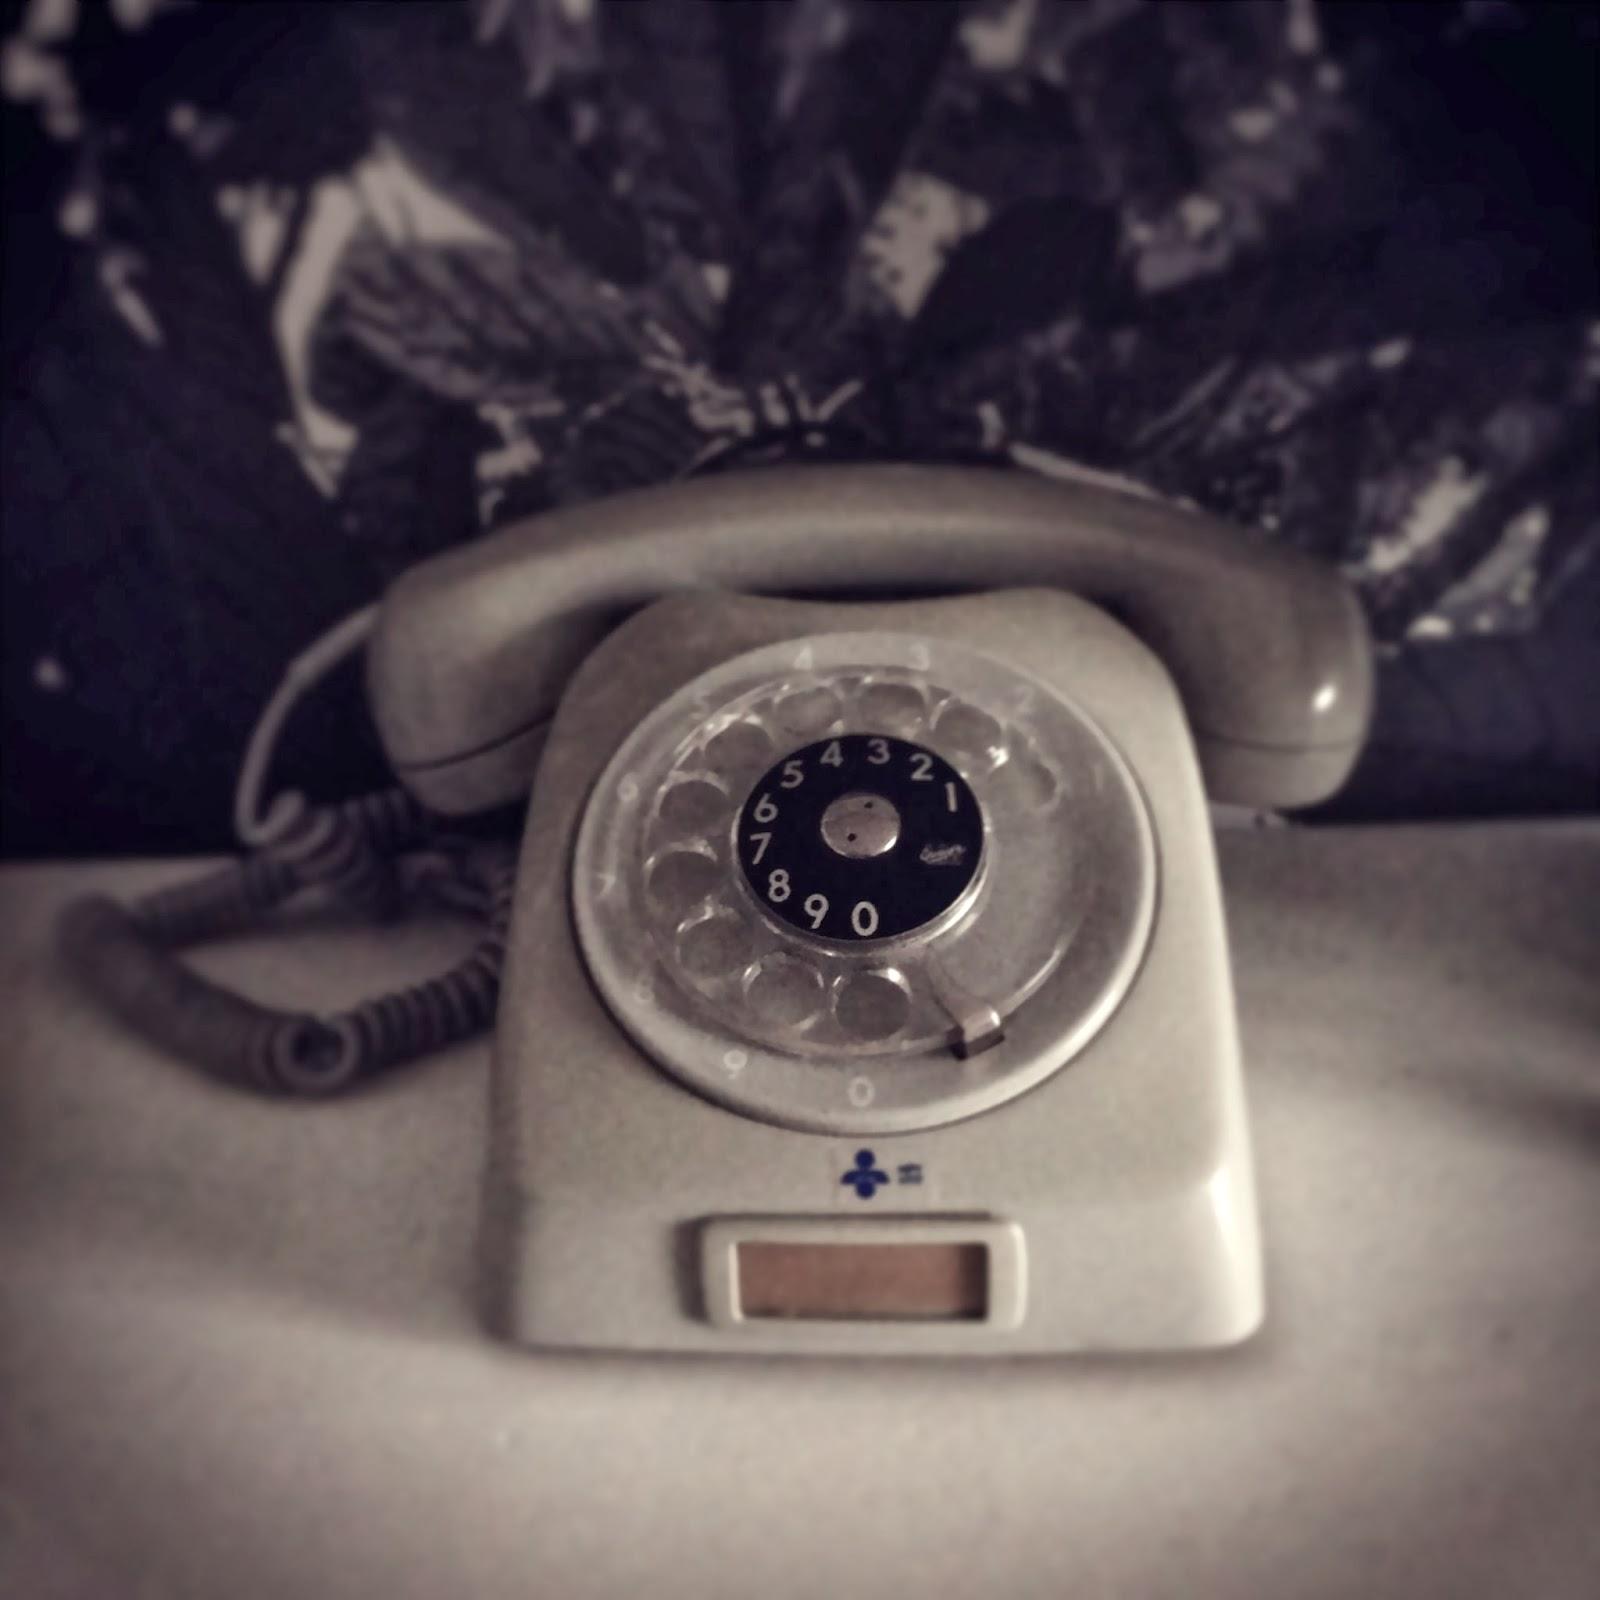 Old telephone, vanha puhelin, gammal telefon